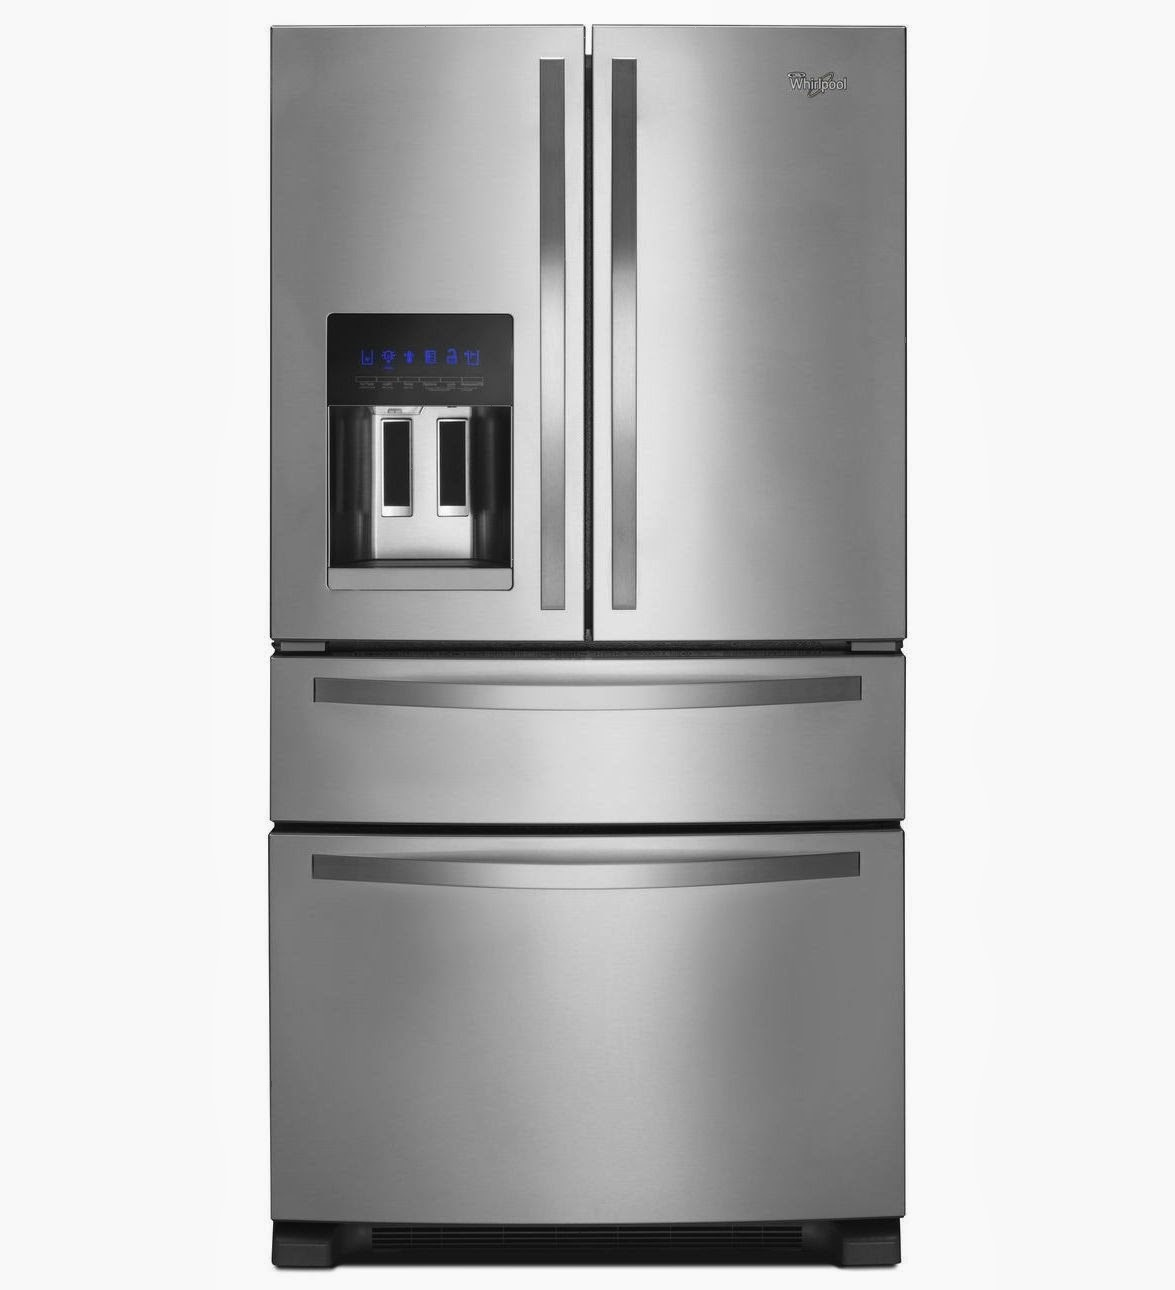 Whirlpool Refrigerator Brand: Whirlpool 25 CF French Door